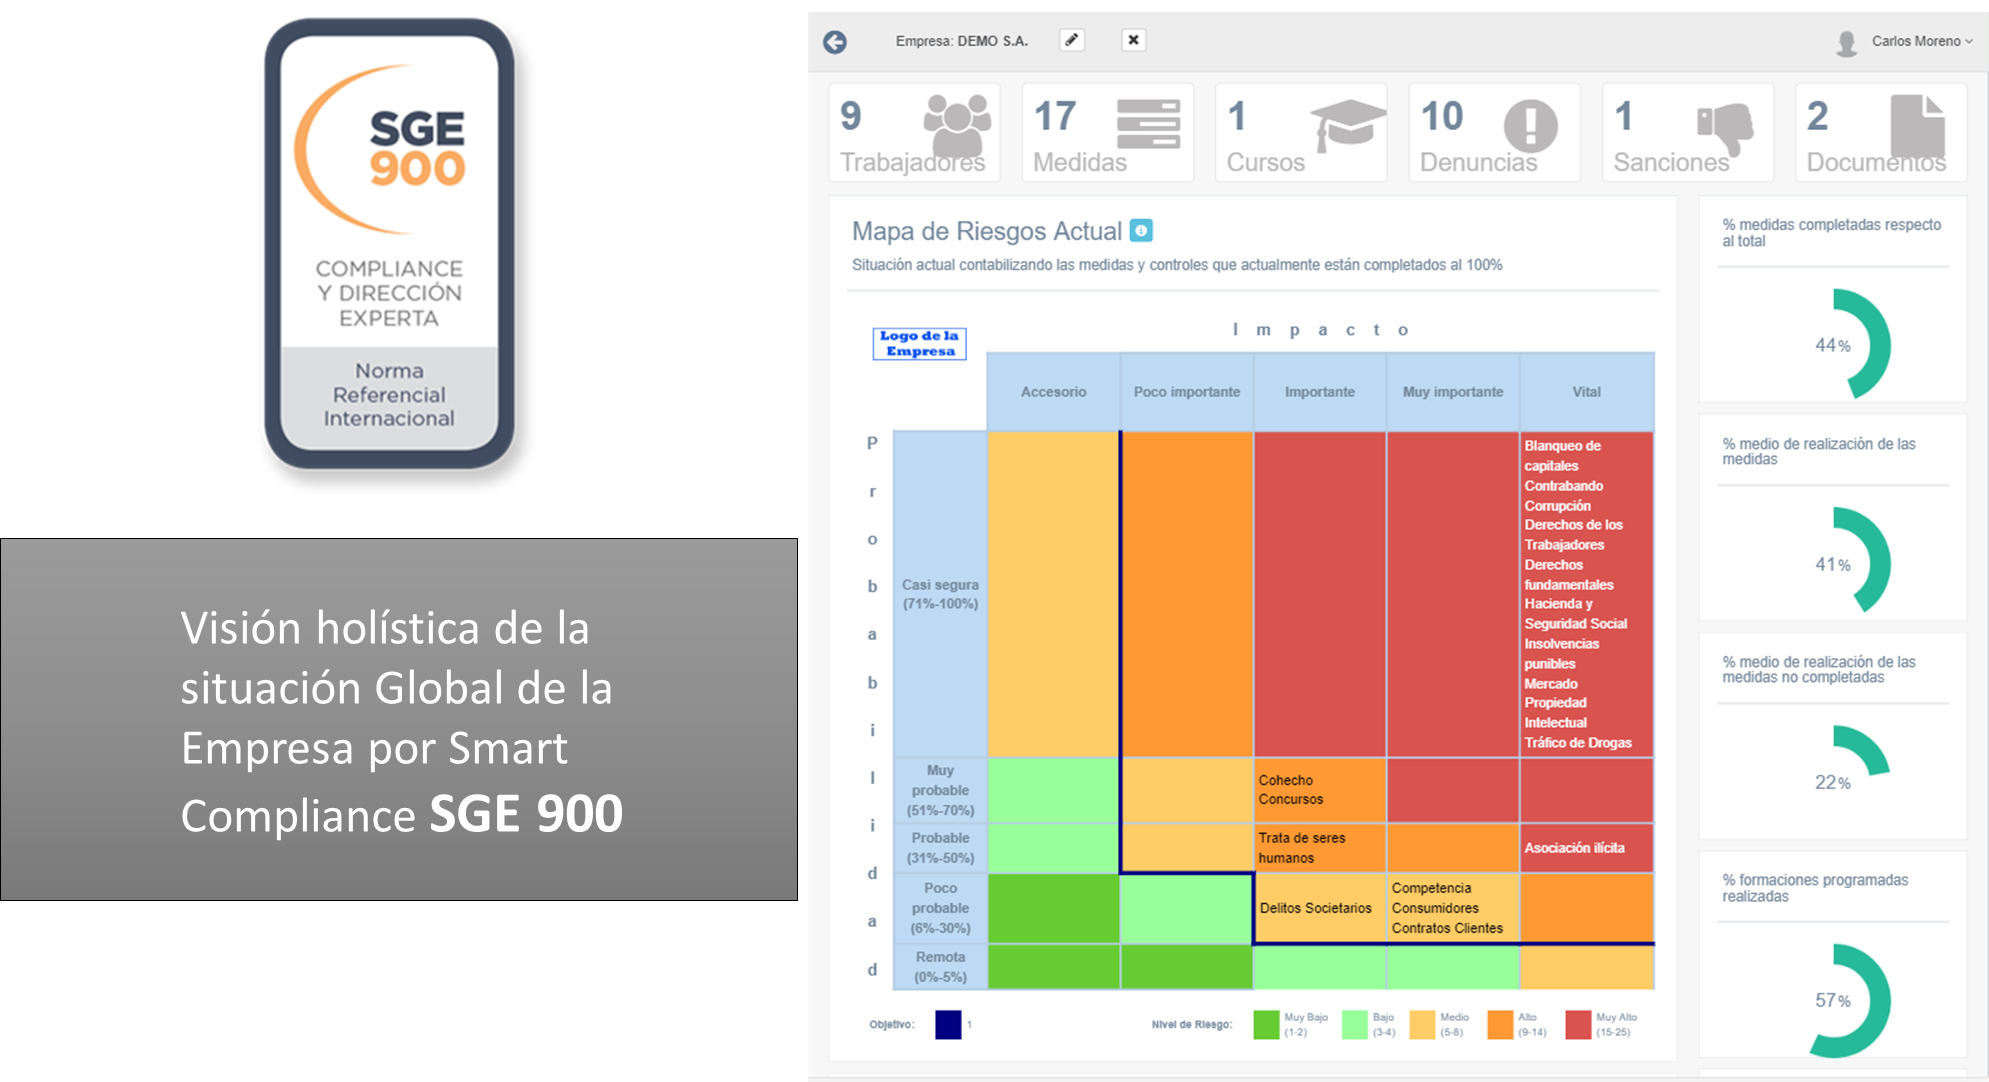 SMART Compliance SGE 900 - Visión Holística